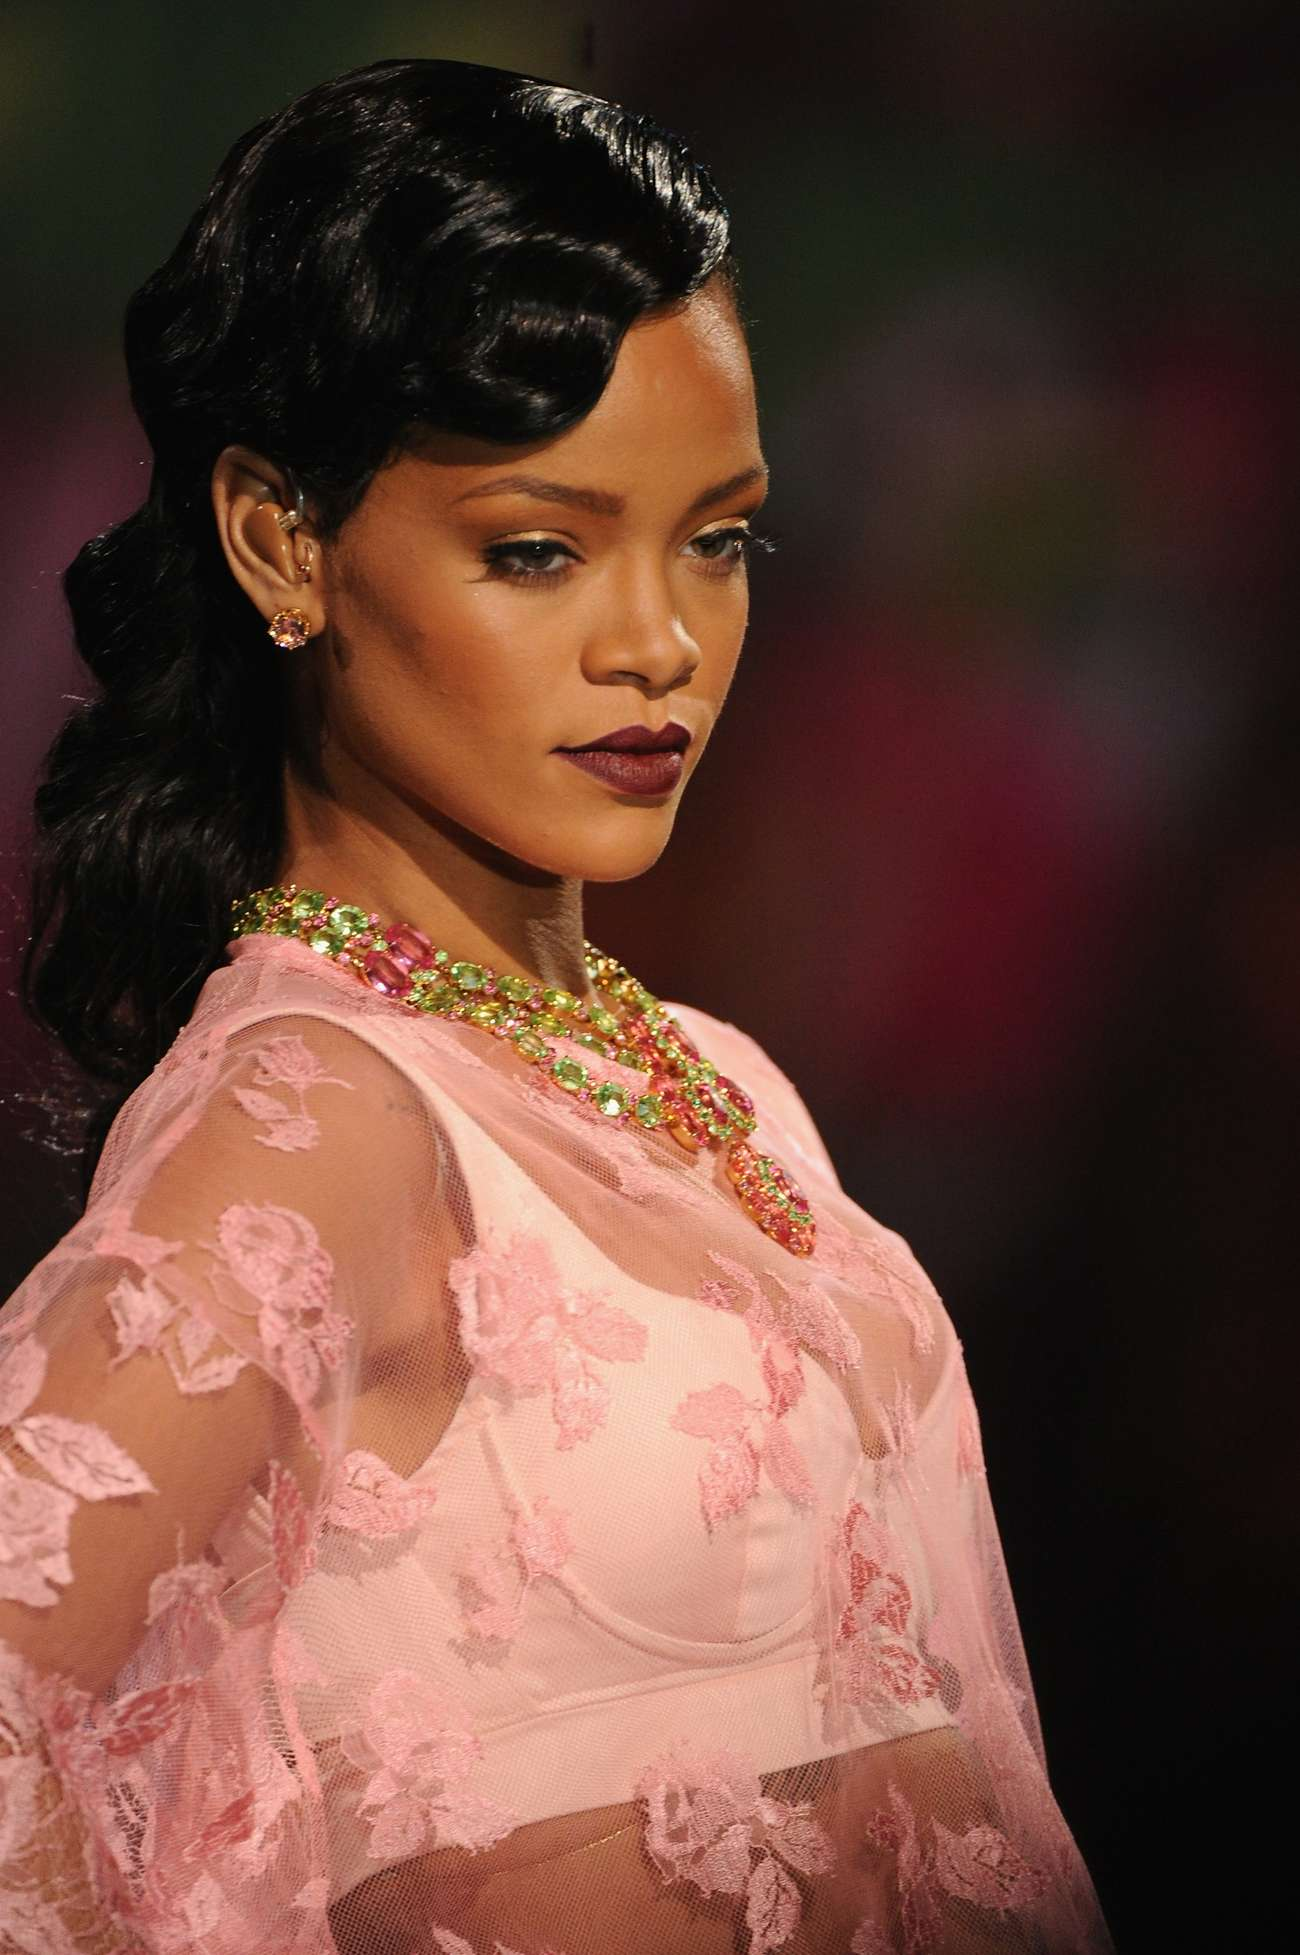 Rihanna New Hairstyle